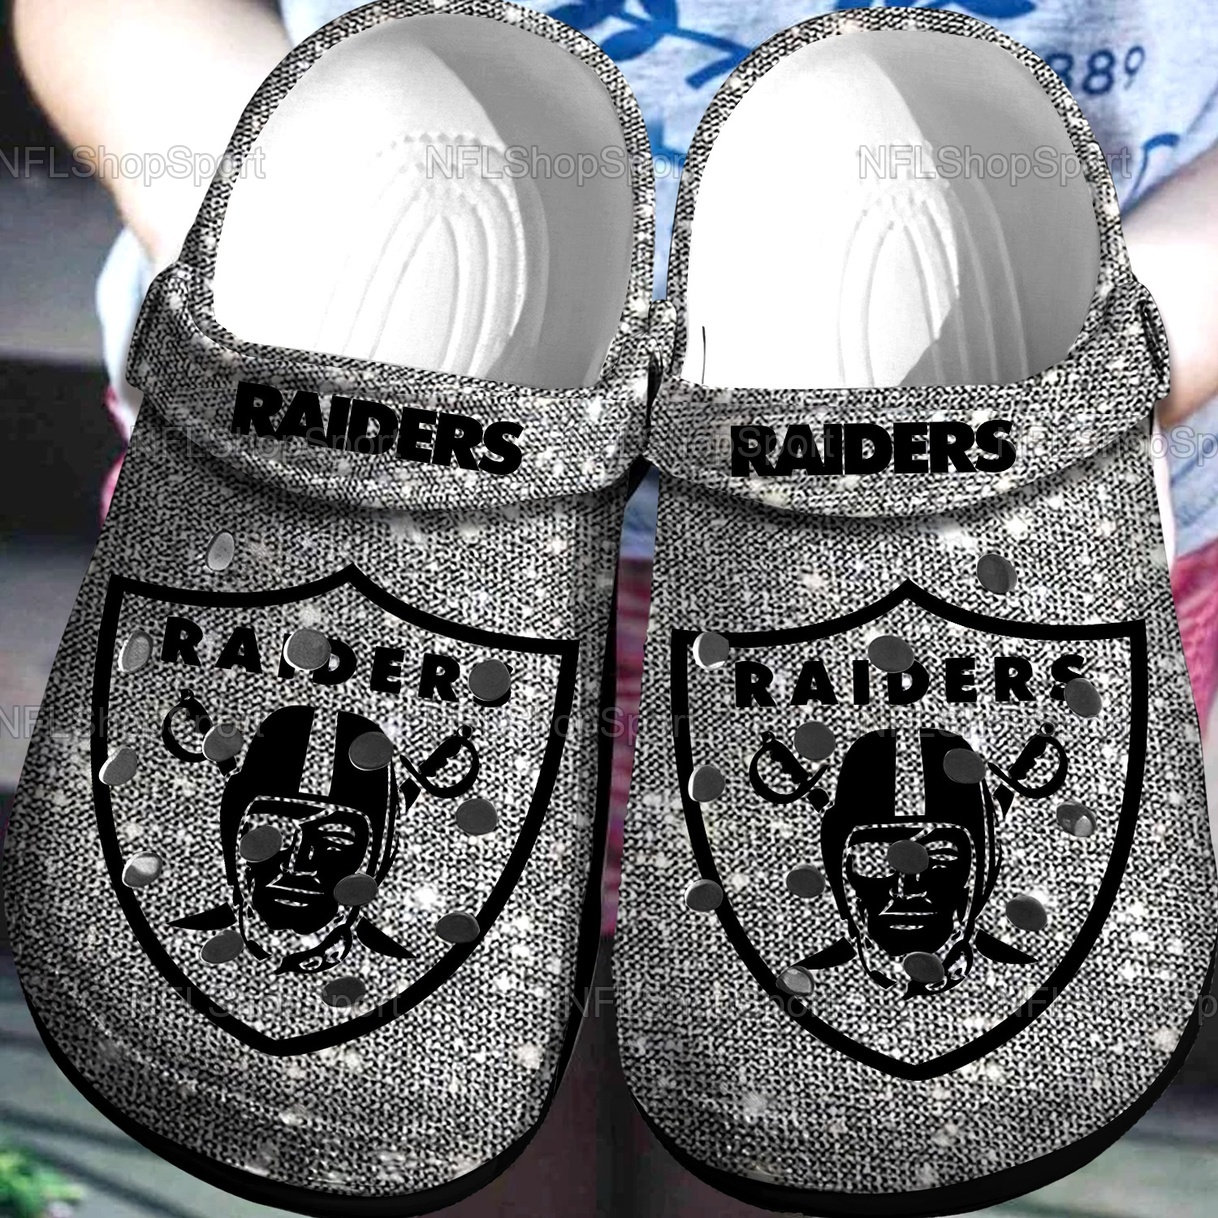 Las Vegas Raiders Nfl Band Crocs Clog Shoes